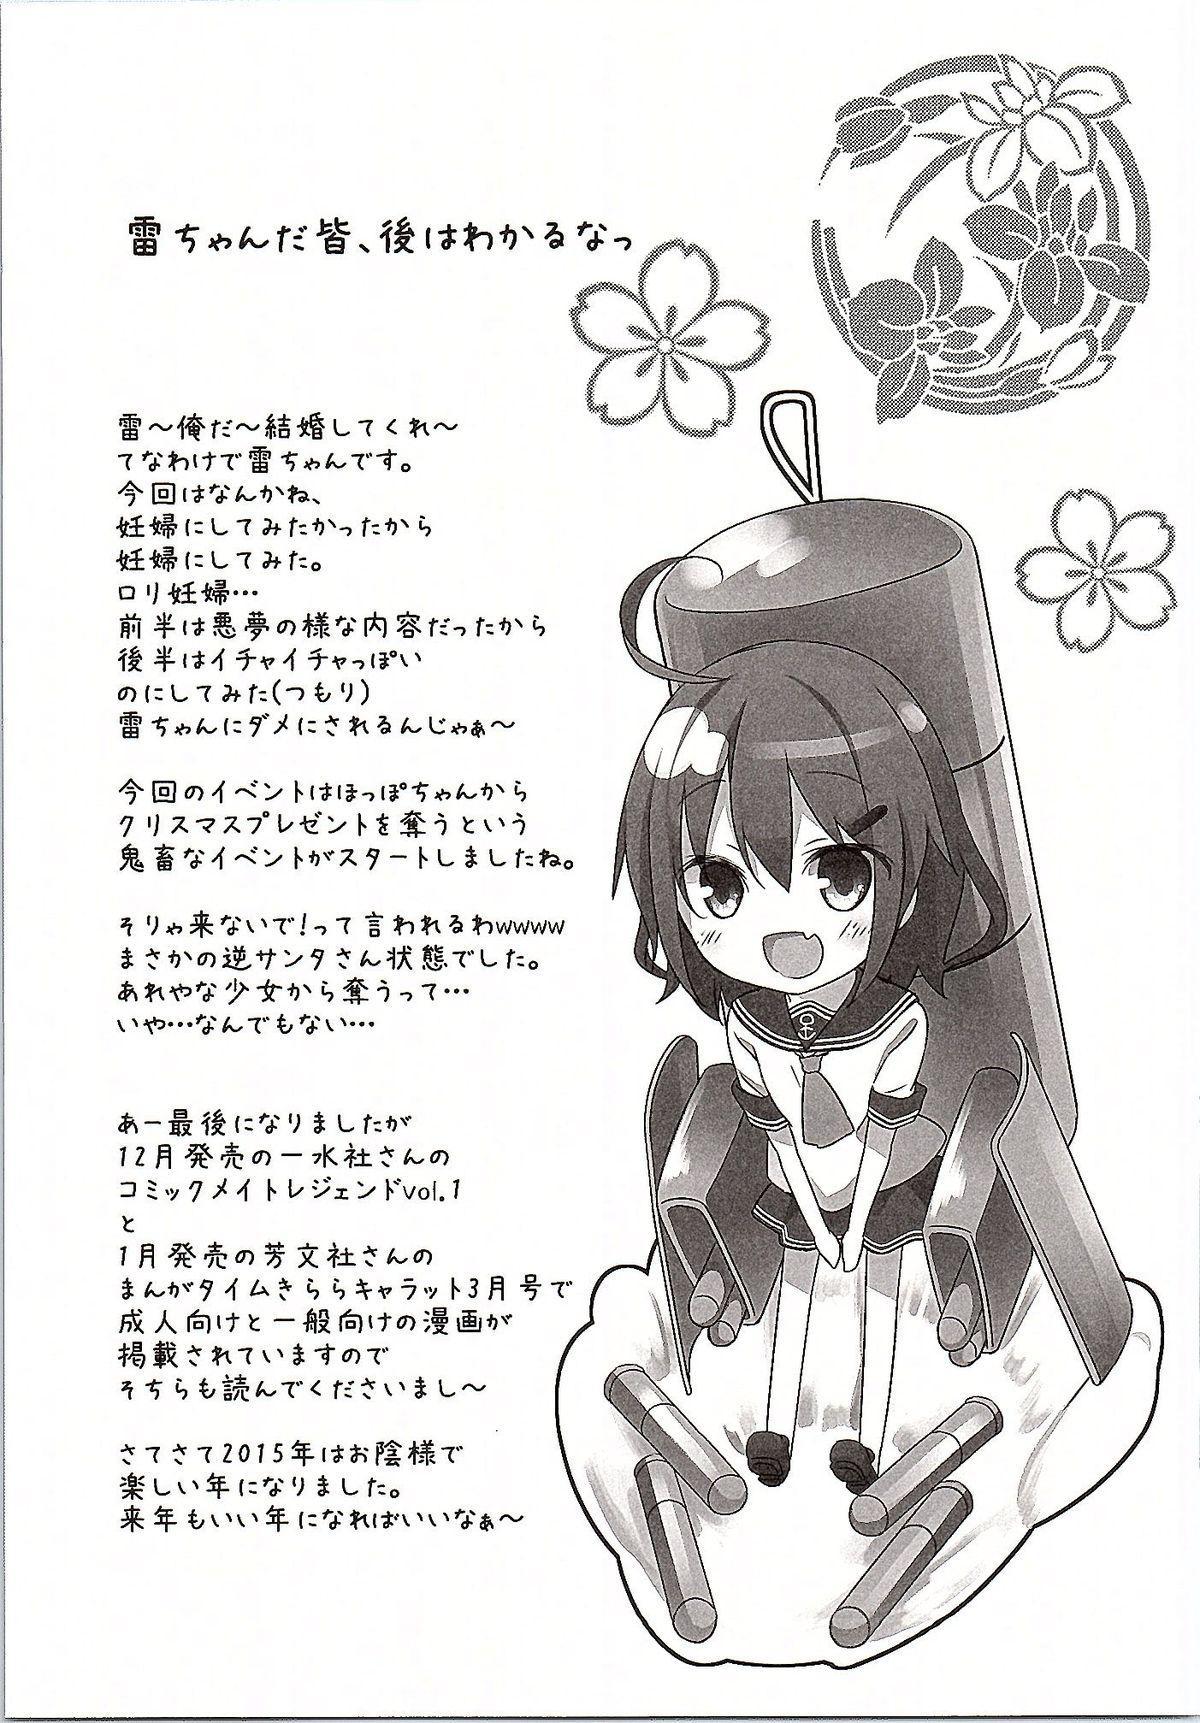 (C87) [Kaname (Siina Yuuki)] Totsugiko!!! Mikishiro-chan Ikazuchi-chan (Oshiro Project ~CASTLE DEFENSE~, Kantai Collection -KanColle-) 17